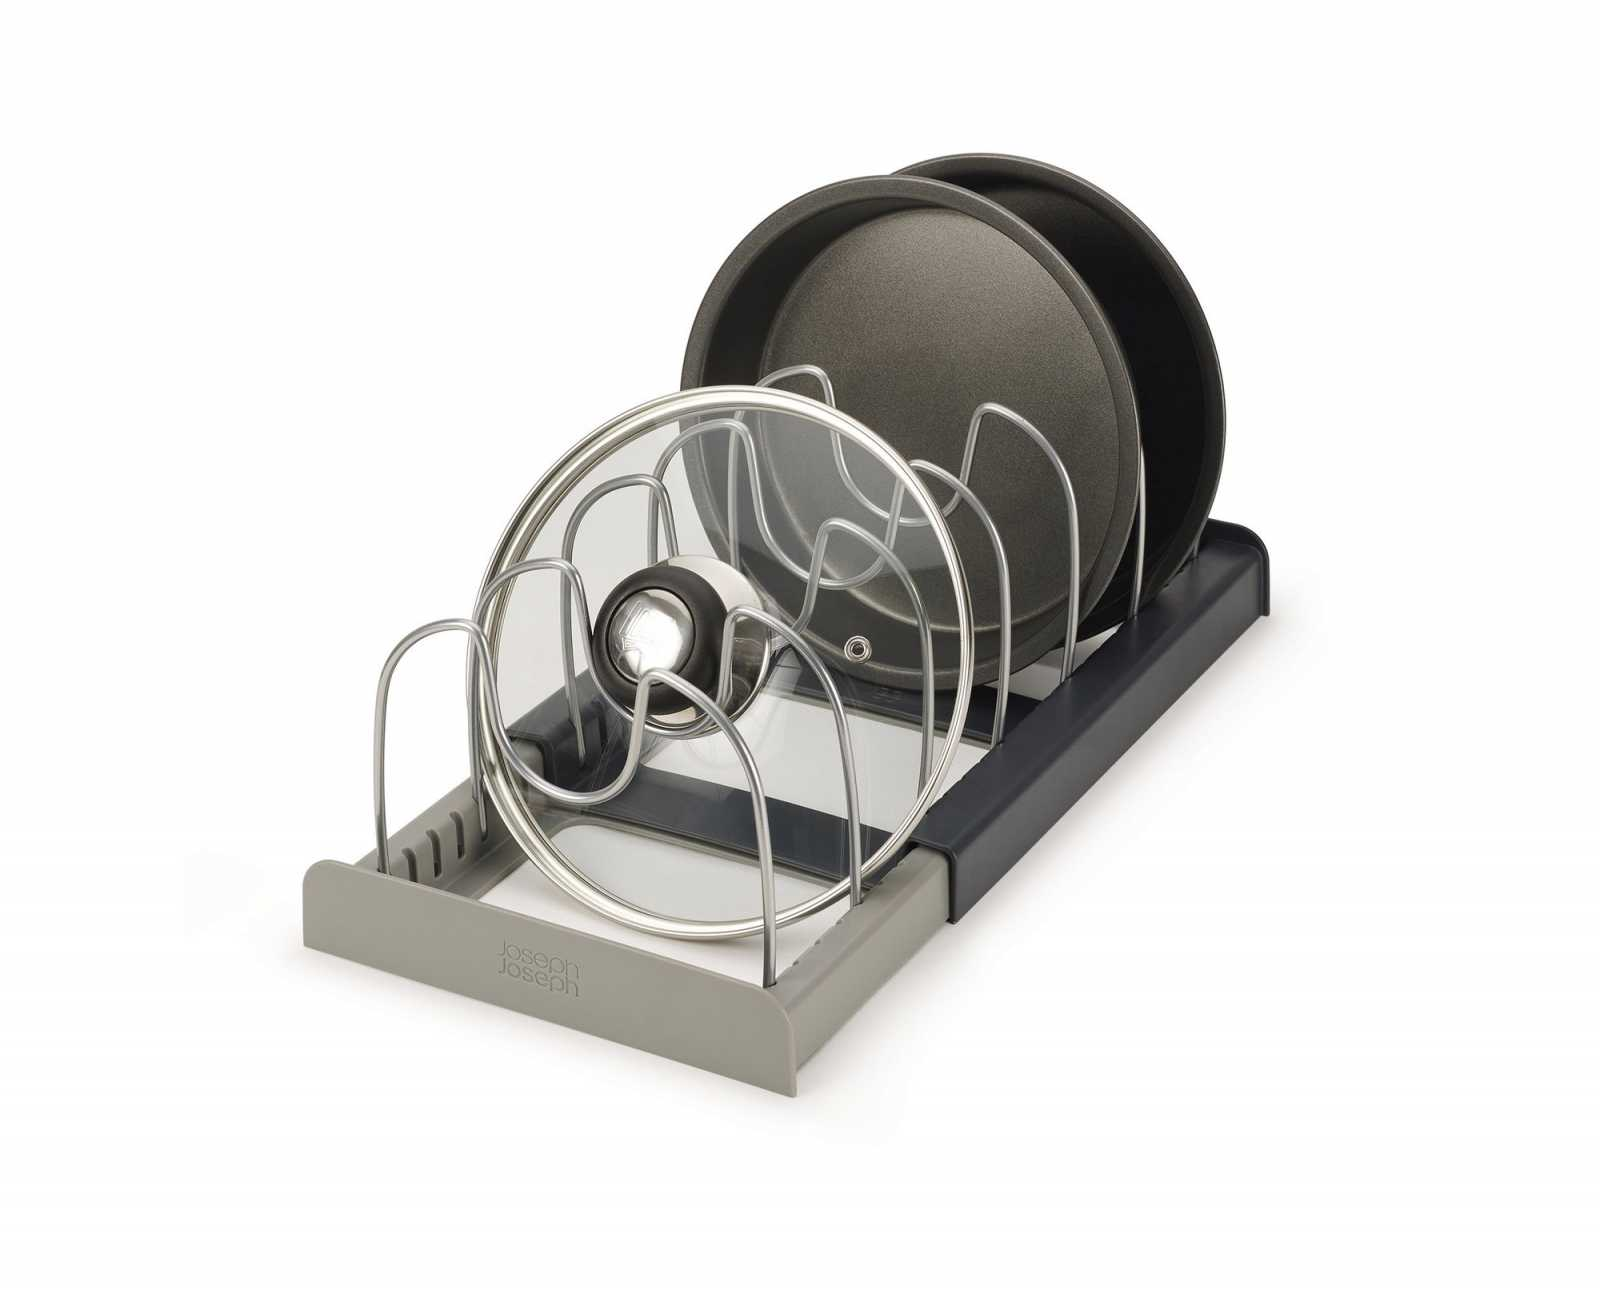 Онлайн каталог PROMENU: Органайзер для сушки посуды раскладной Joseph Joseph DRAWERSTORE, серый Joseph Joseph 85167